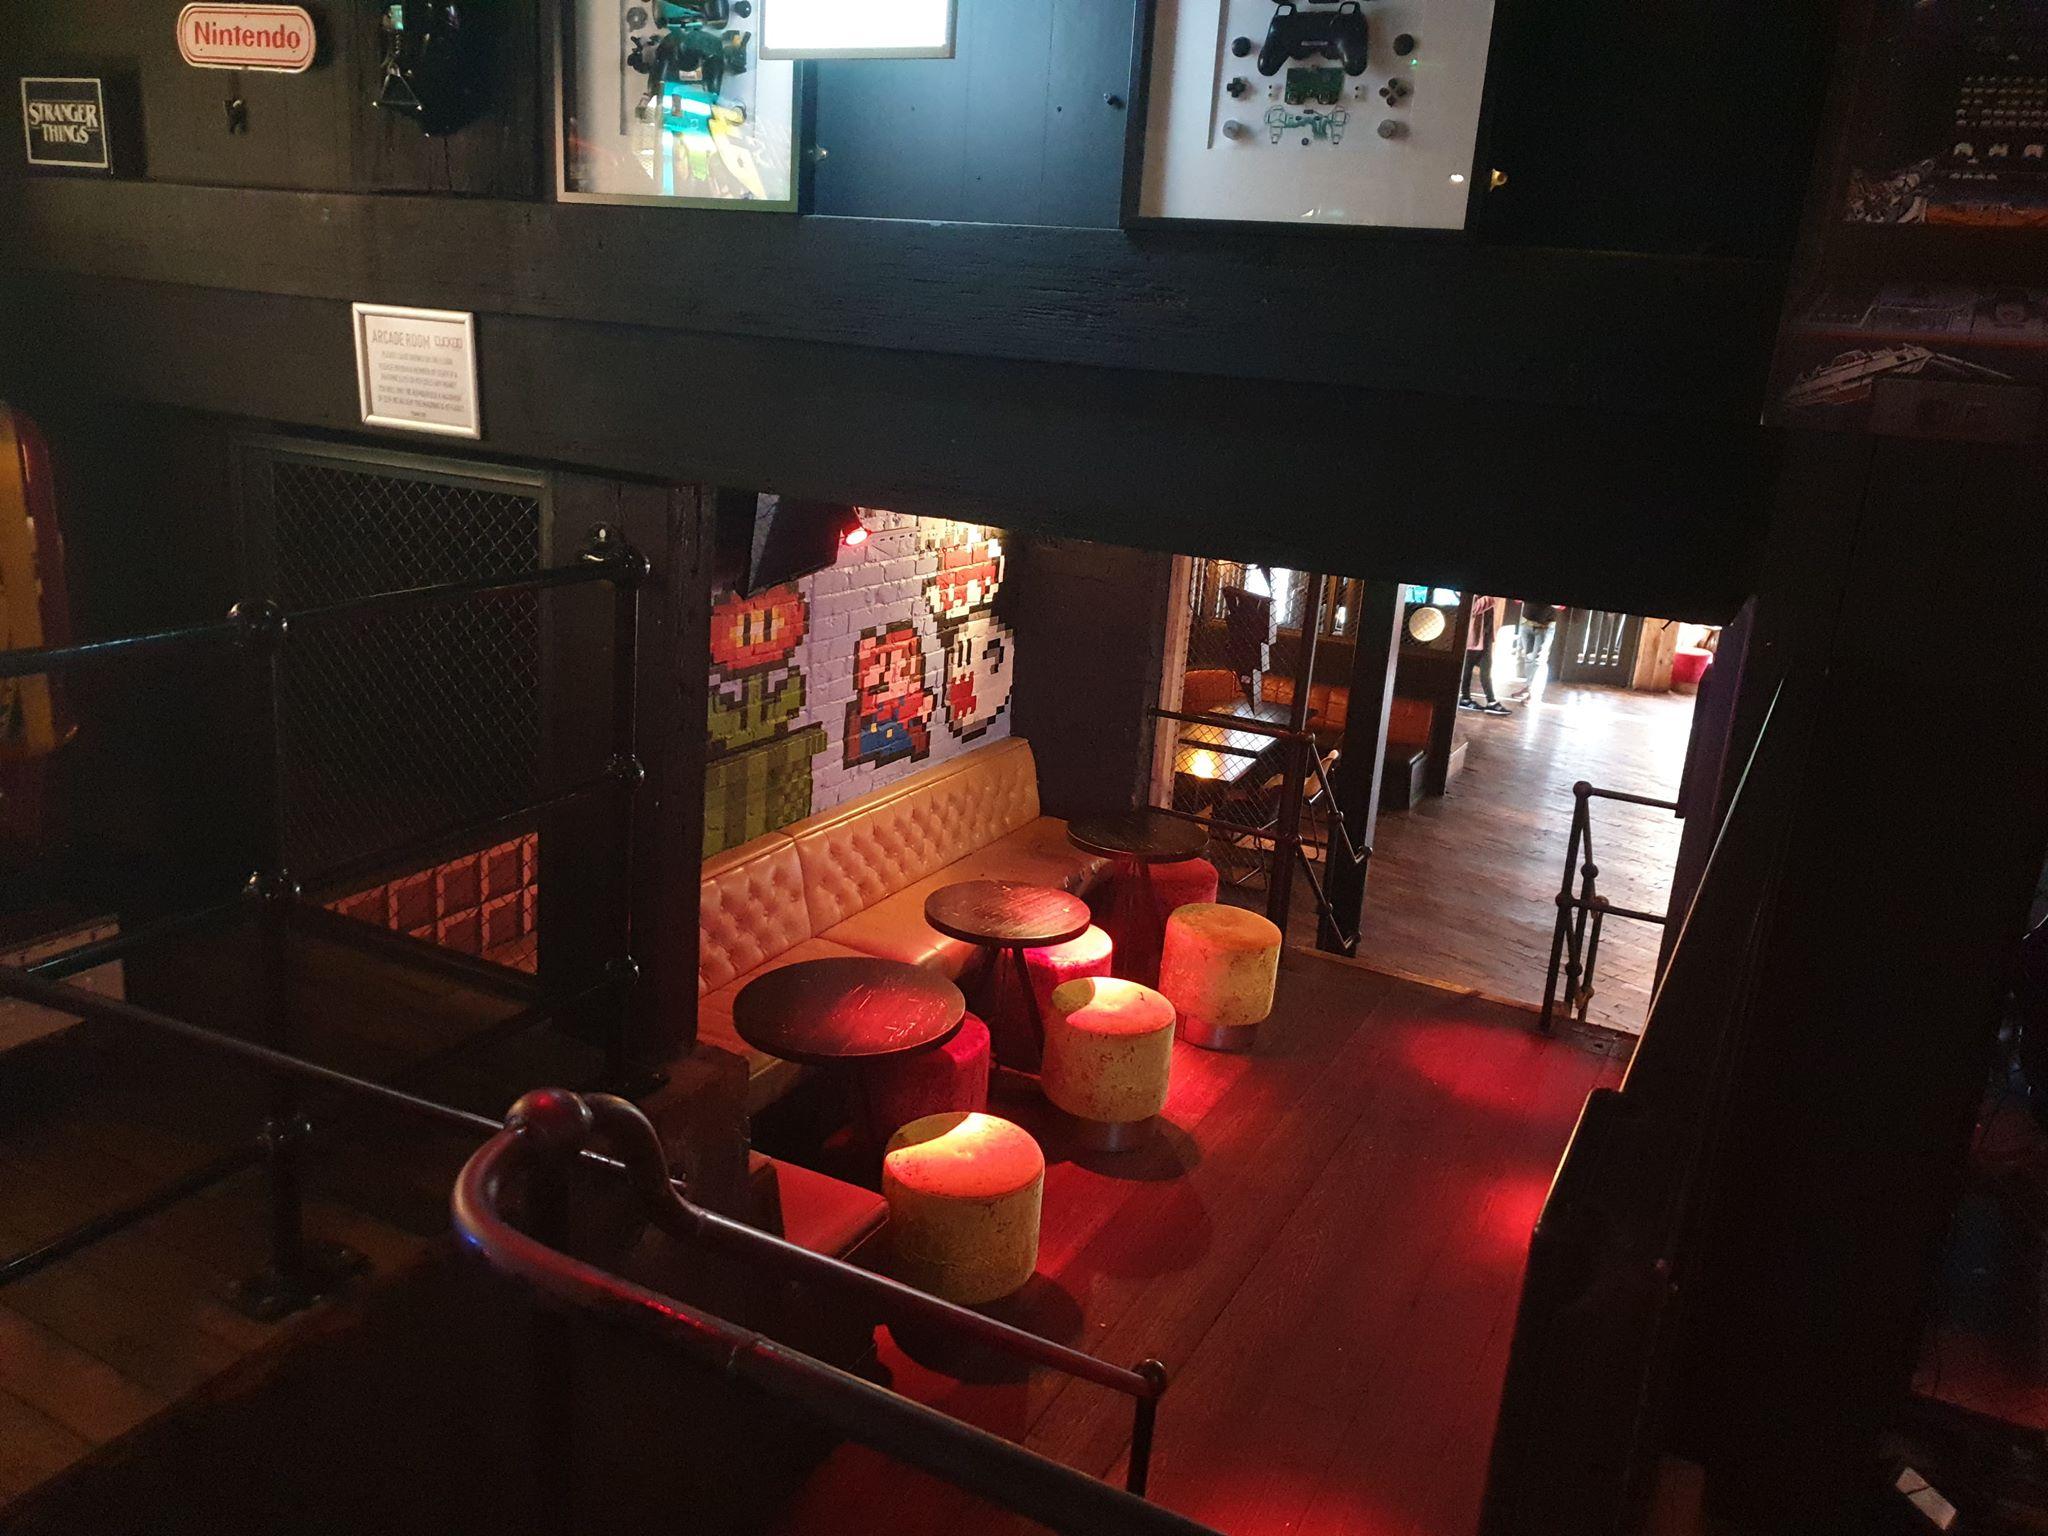 Arcade seating